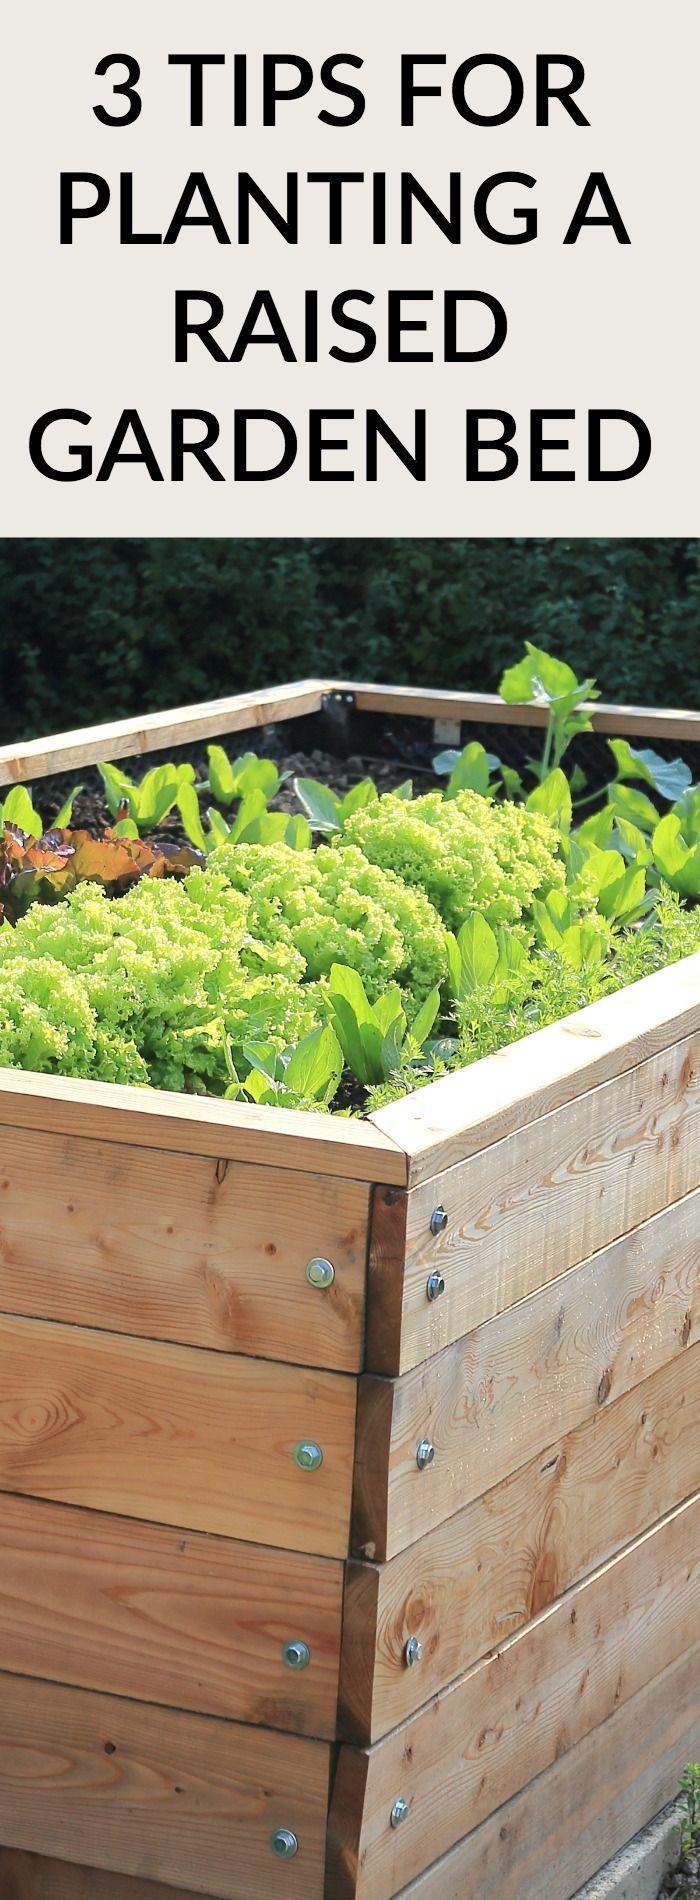 3 TIPS FOR PLANTING IN A RAISED GARDEN BED Raised garden